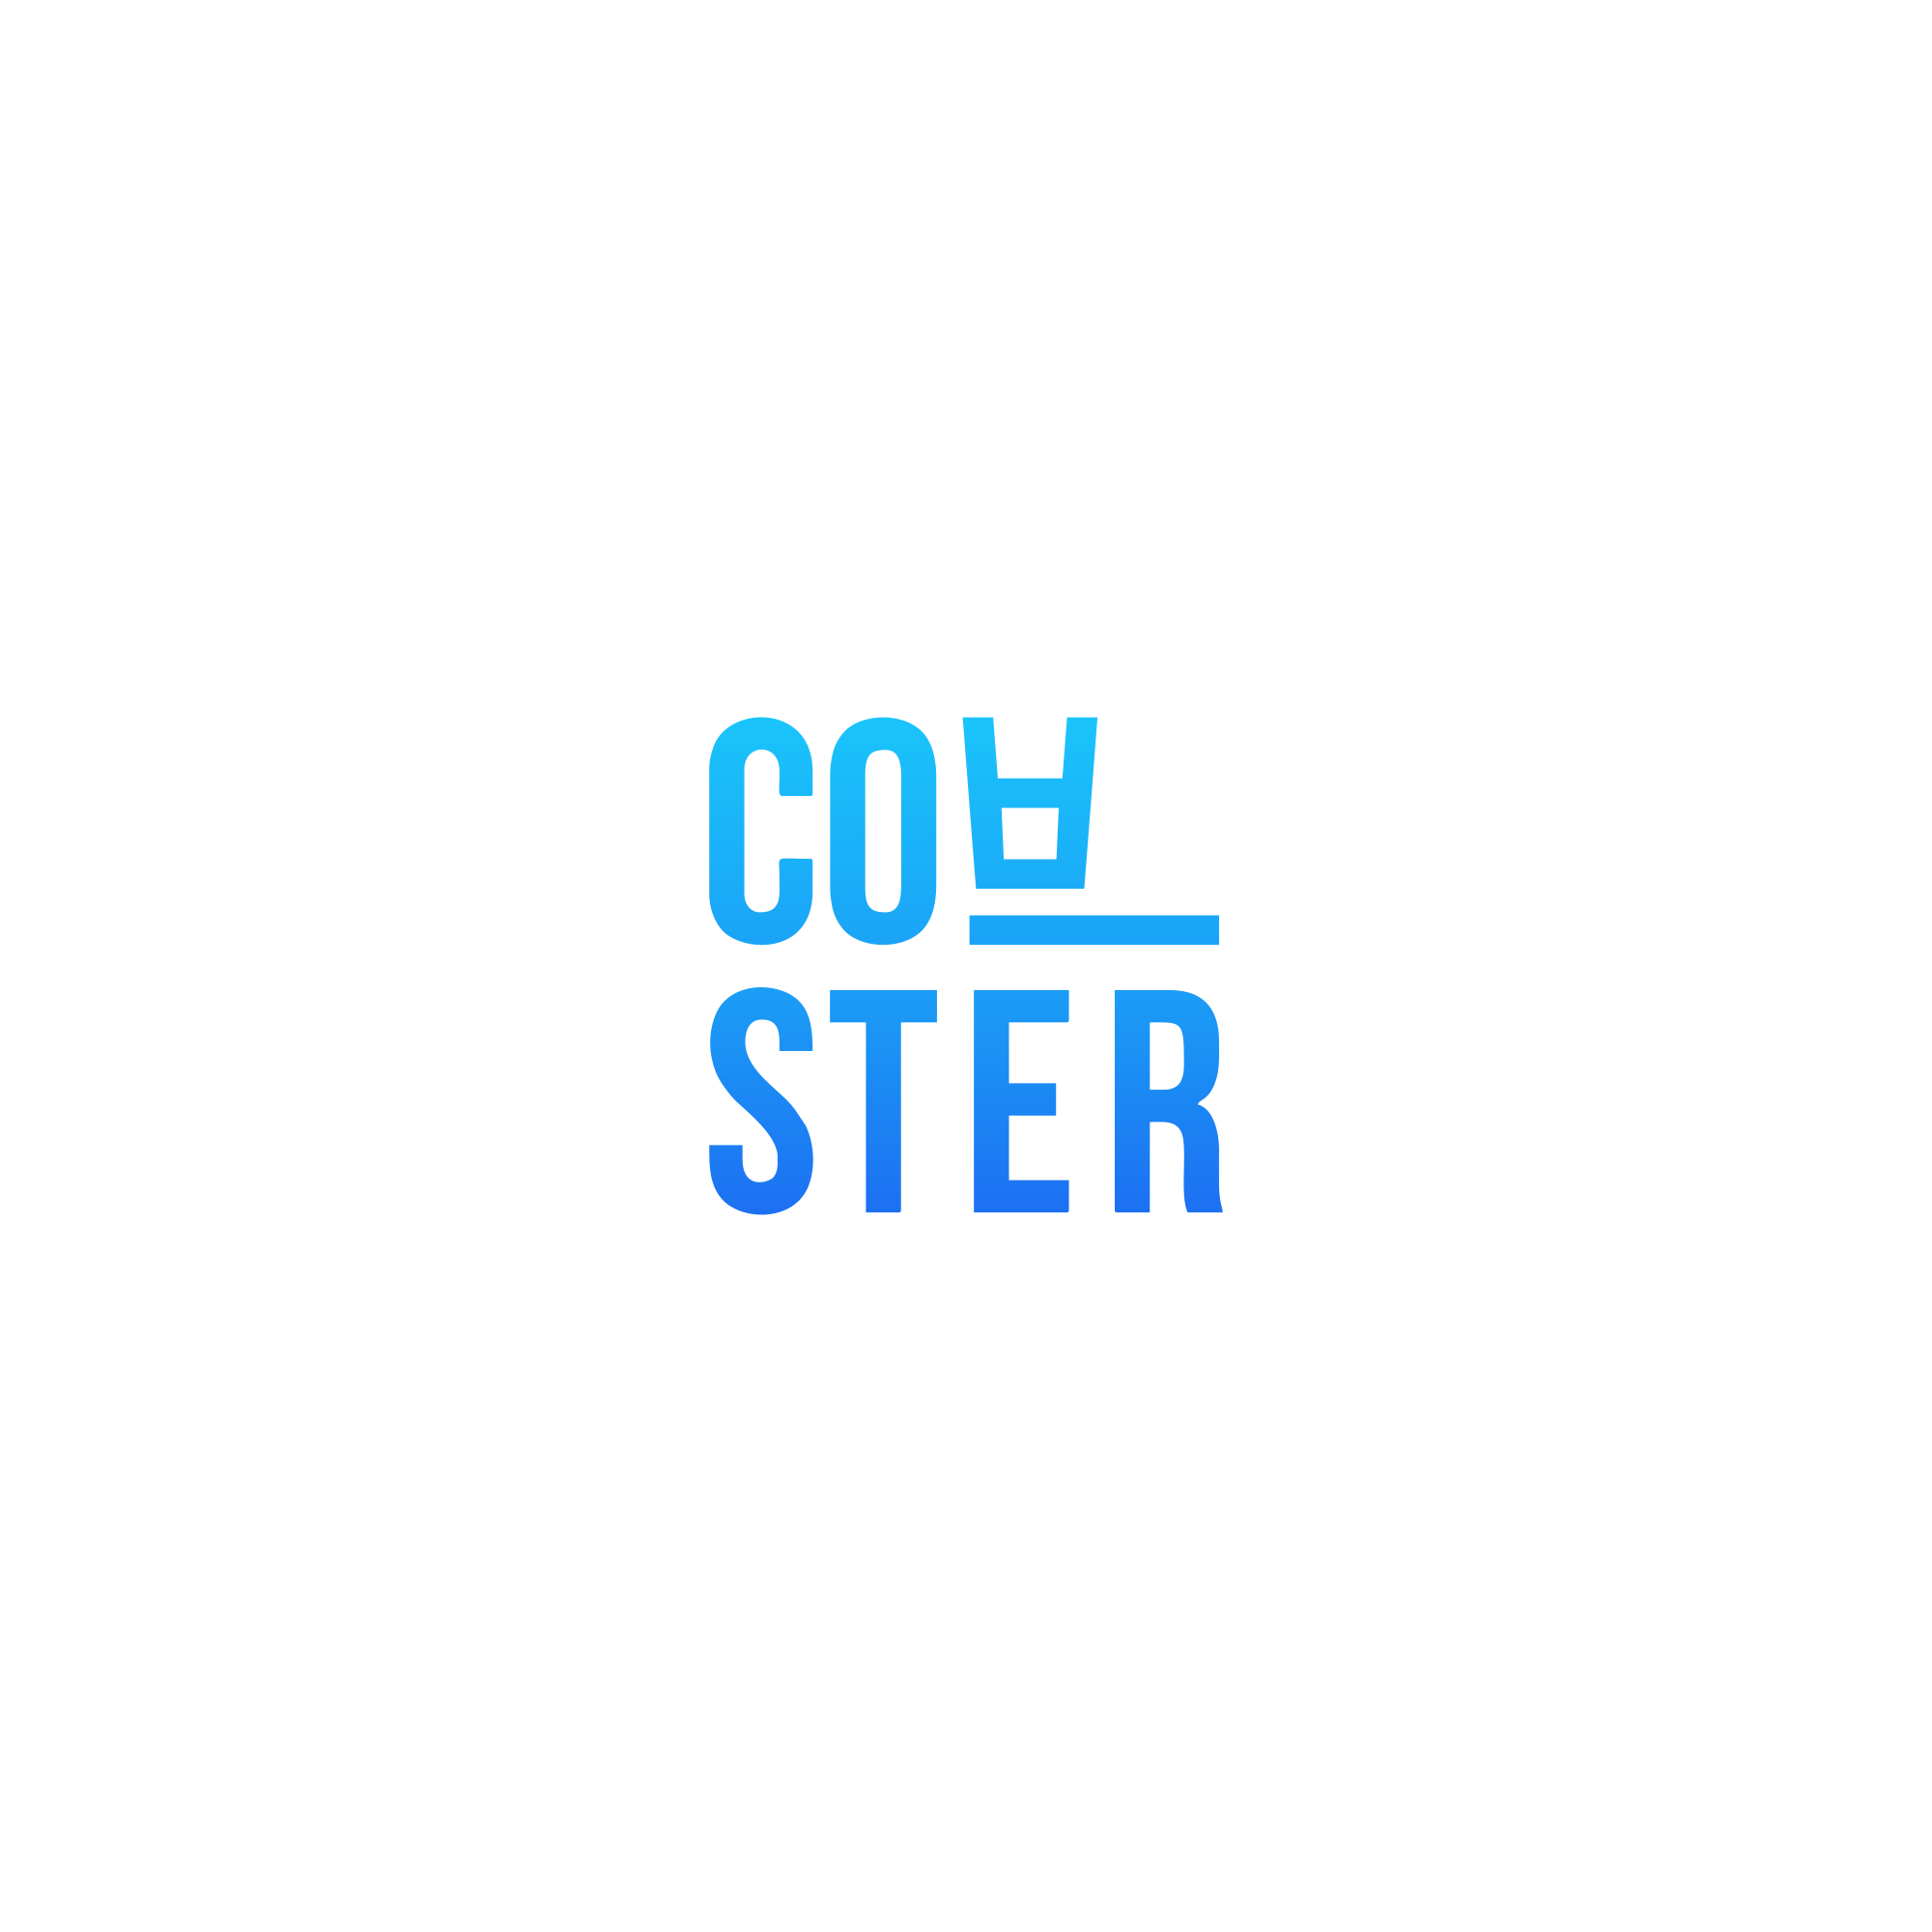 App logo/icon design